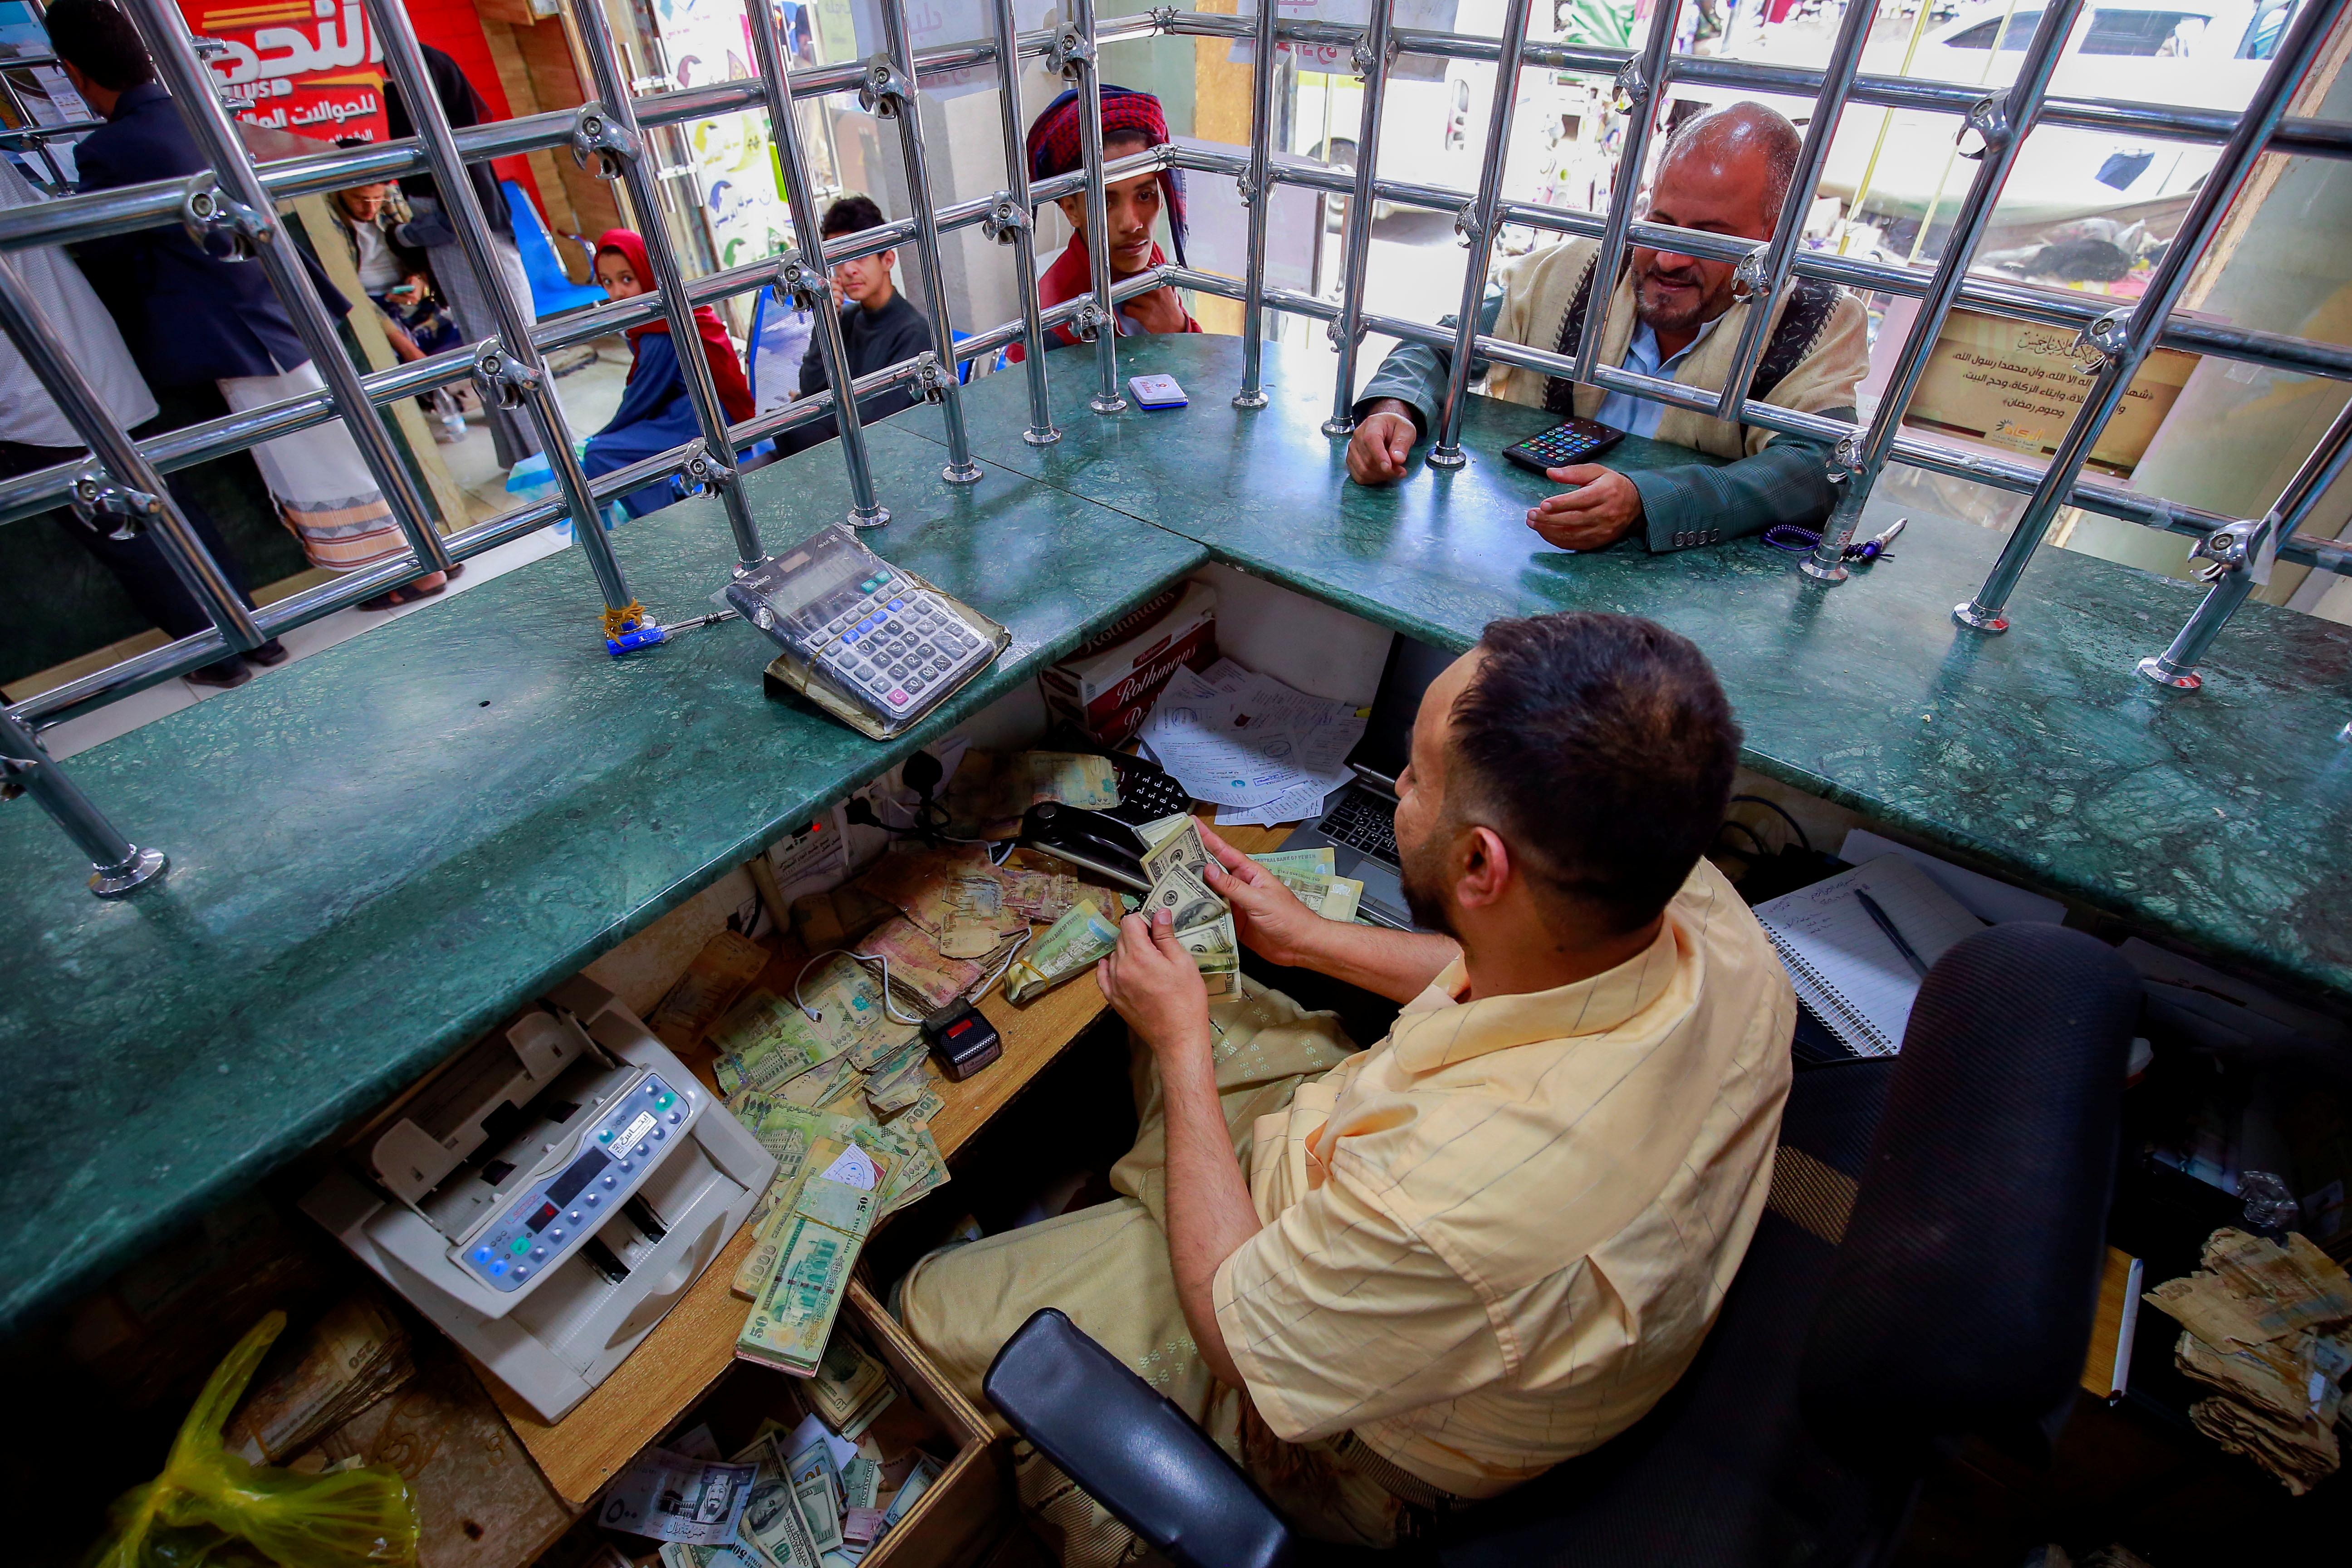 A currency exchange worker sits behind security bars at an exchange company in Sanaa, Yemen June 28, 2021. REUTERS/Nusaibah Almuaalemi